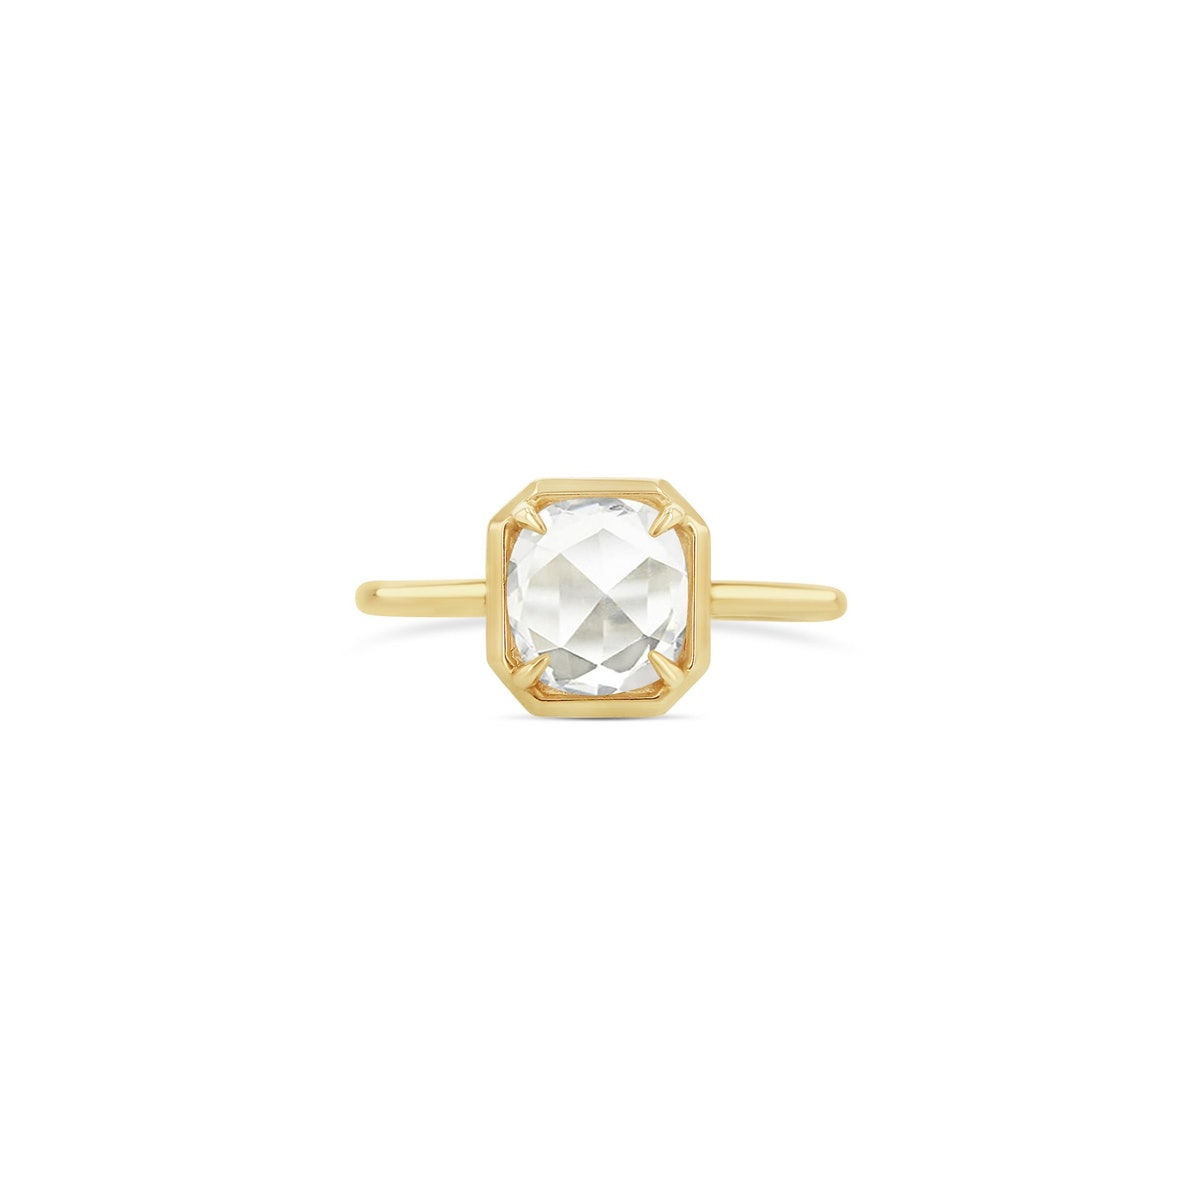 Oval Rose-Cut Diamond Octagonal Bezel Ring